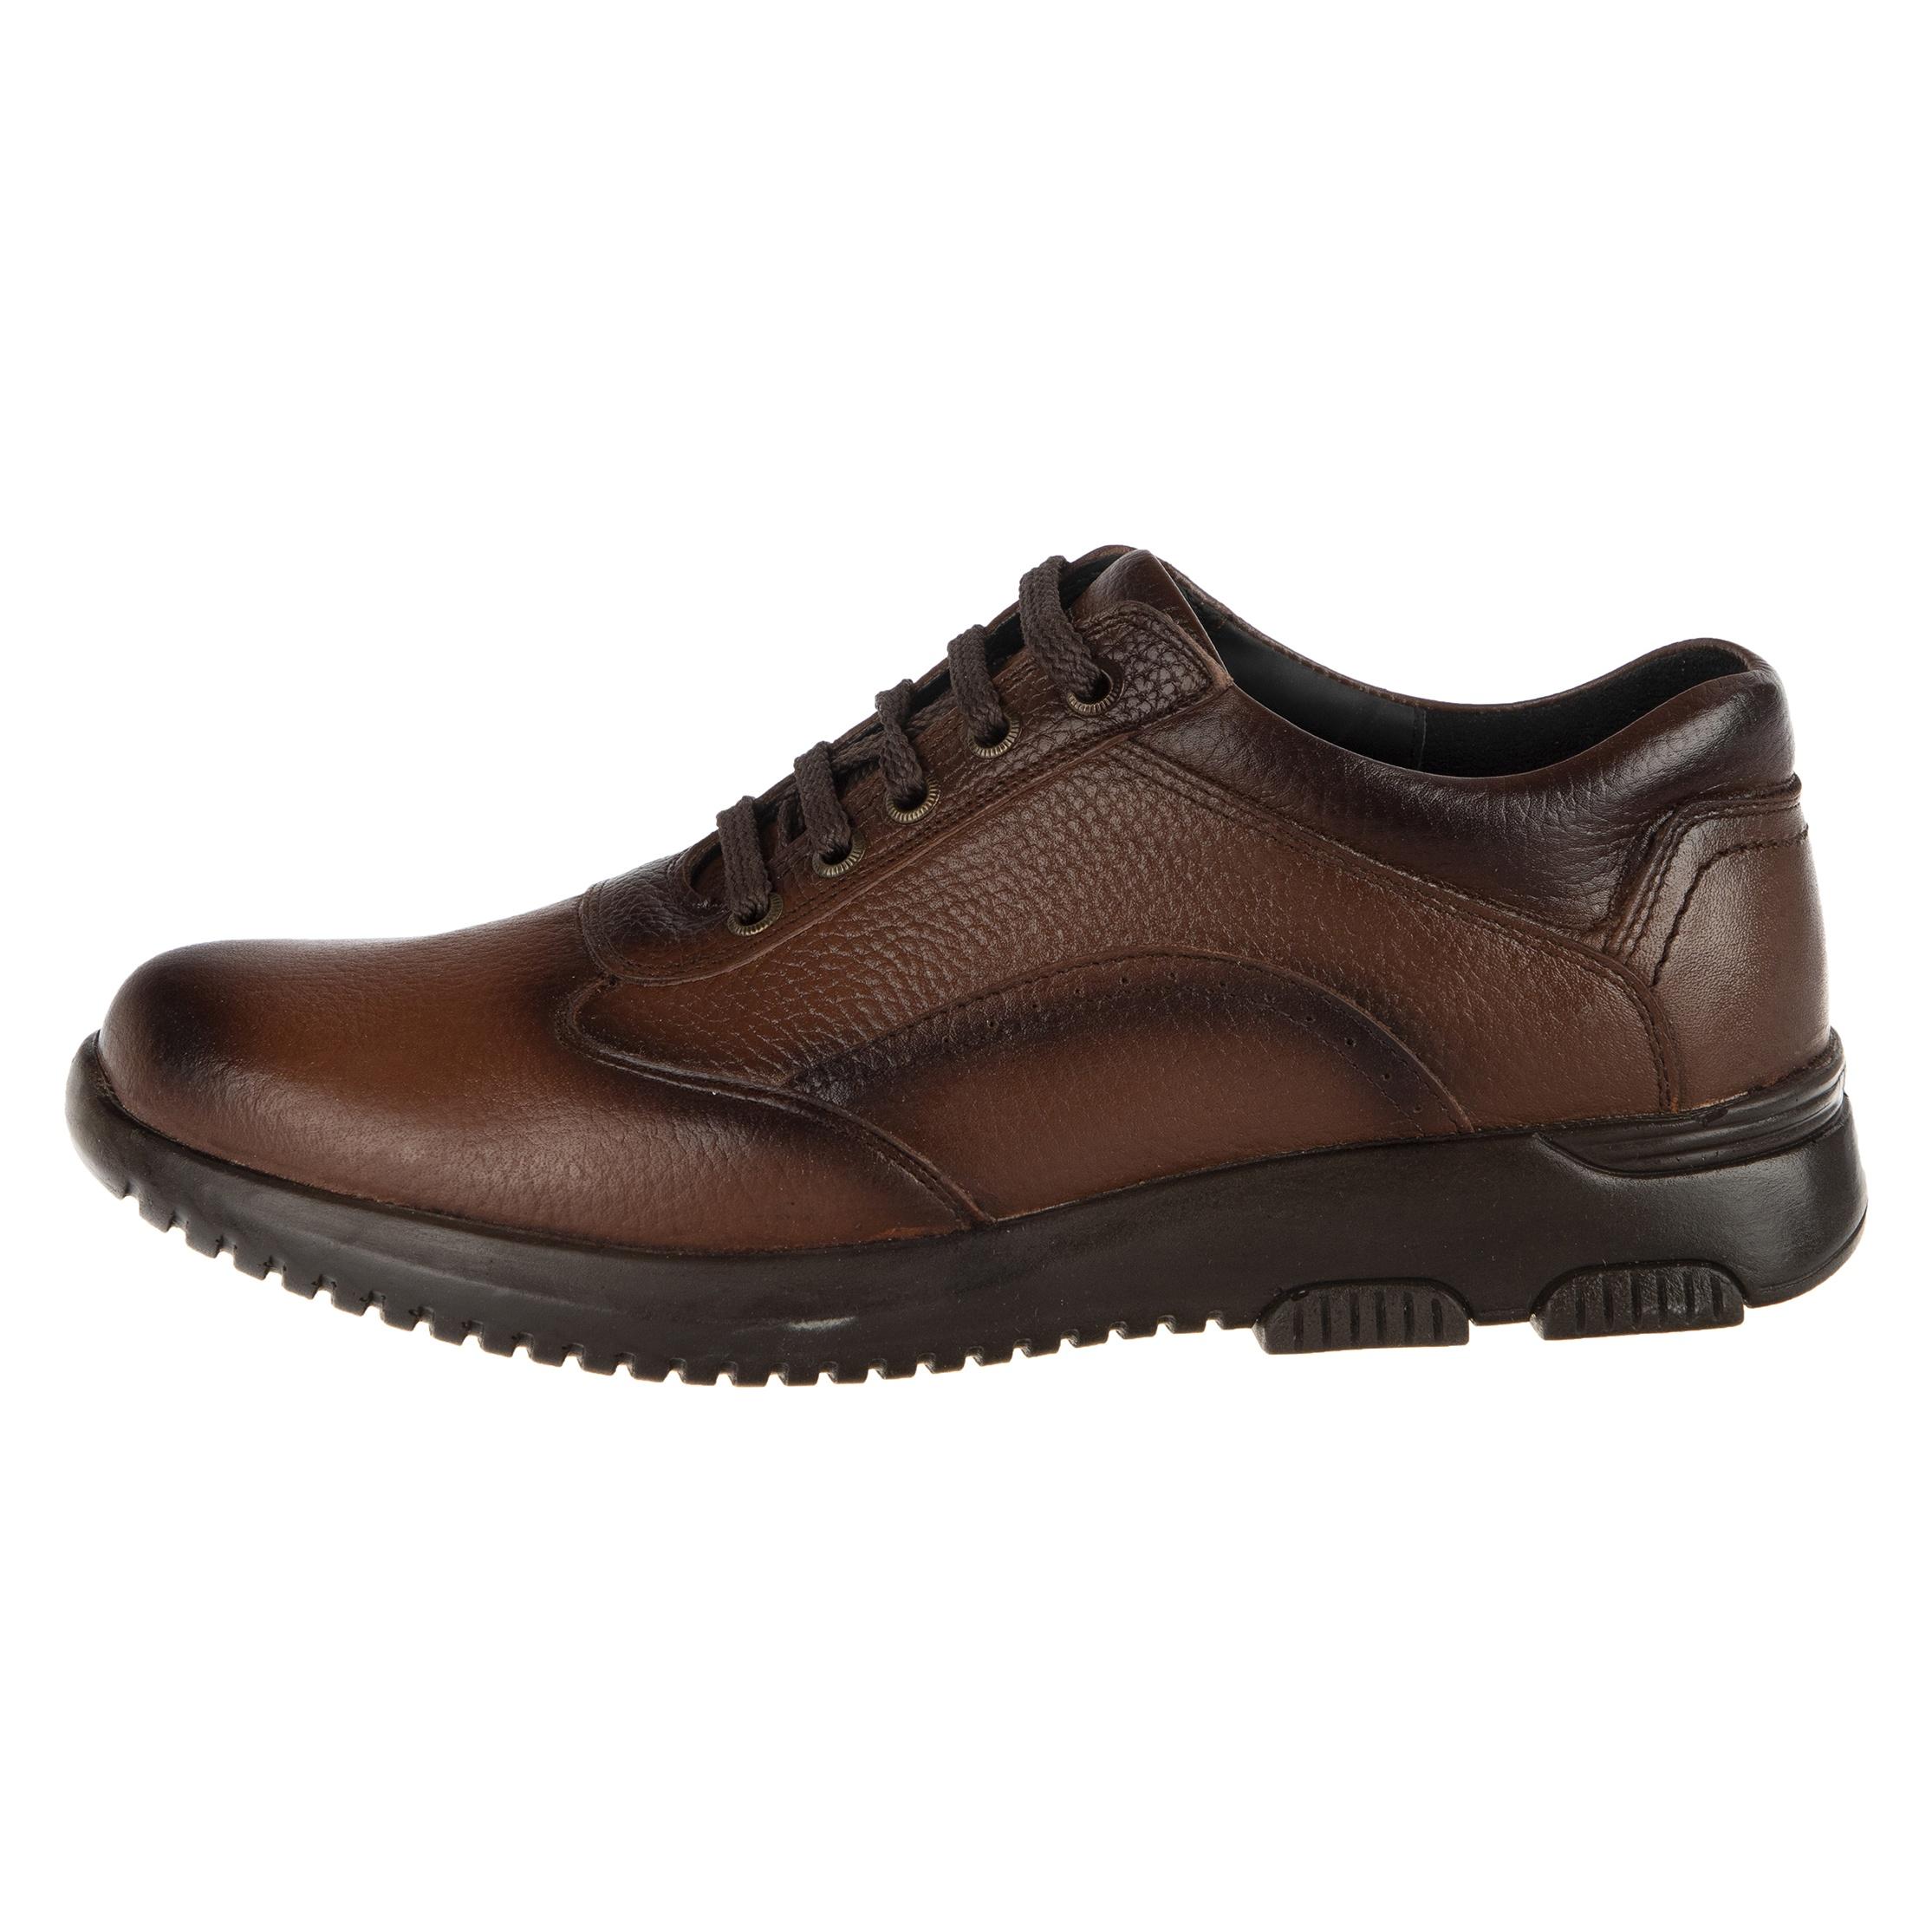 قیمت خرید کفش روزمره مردانه دانادل مدل 7713A503136 اورجینال